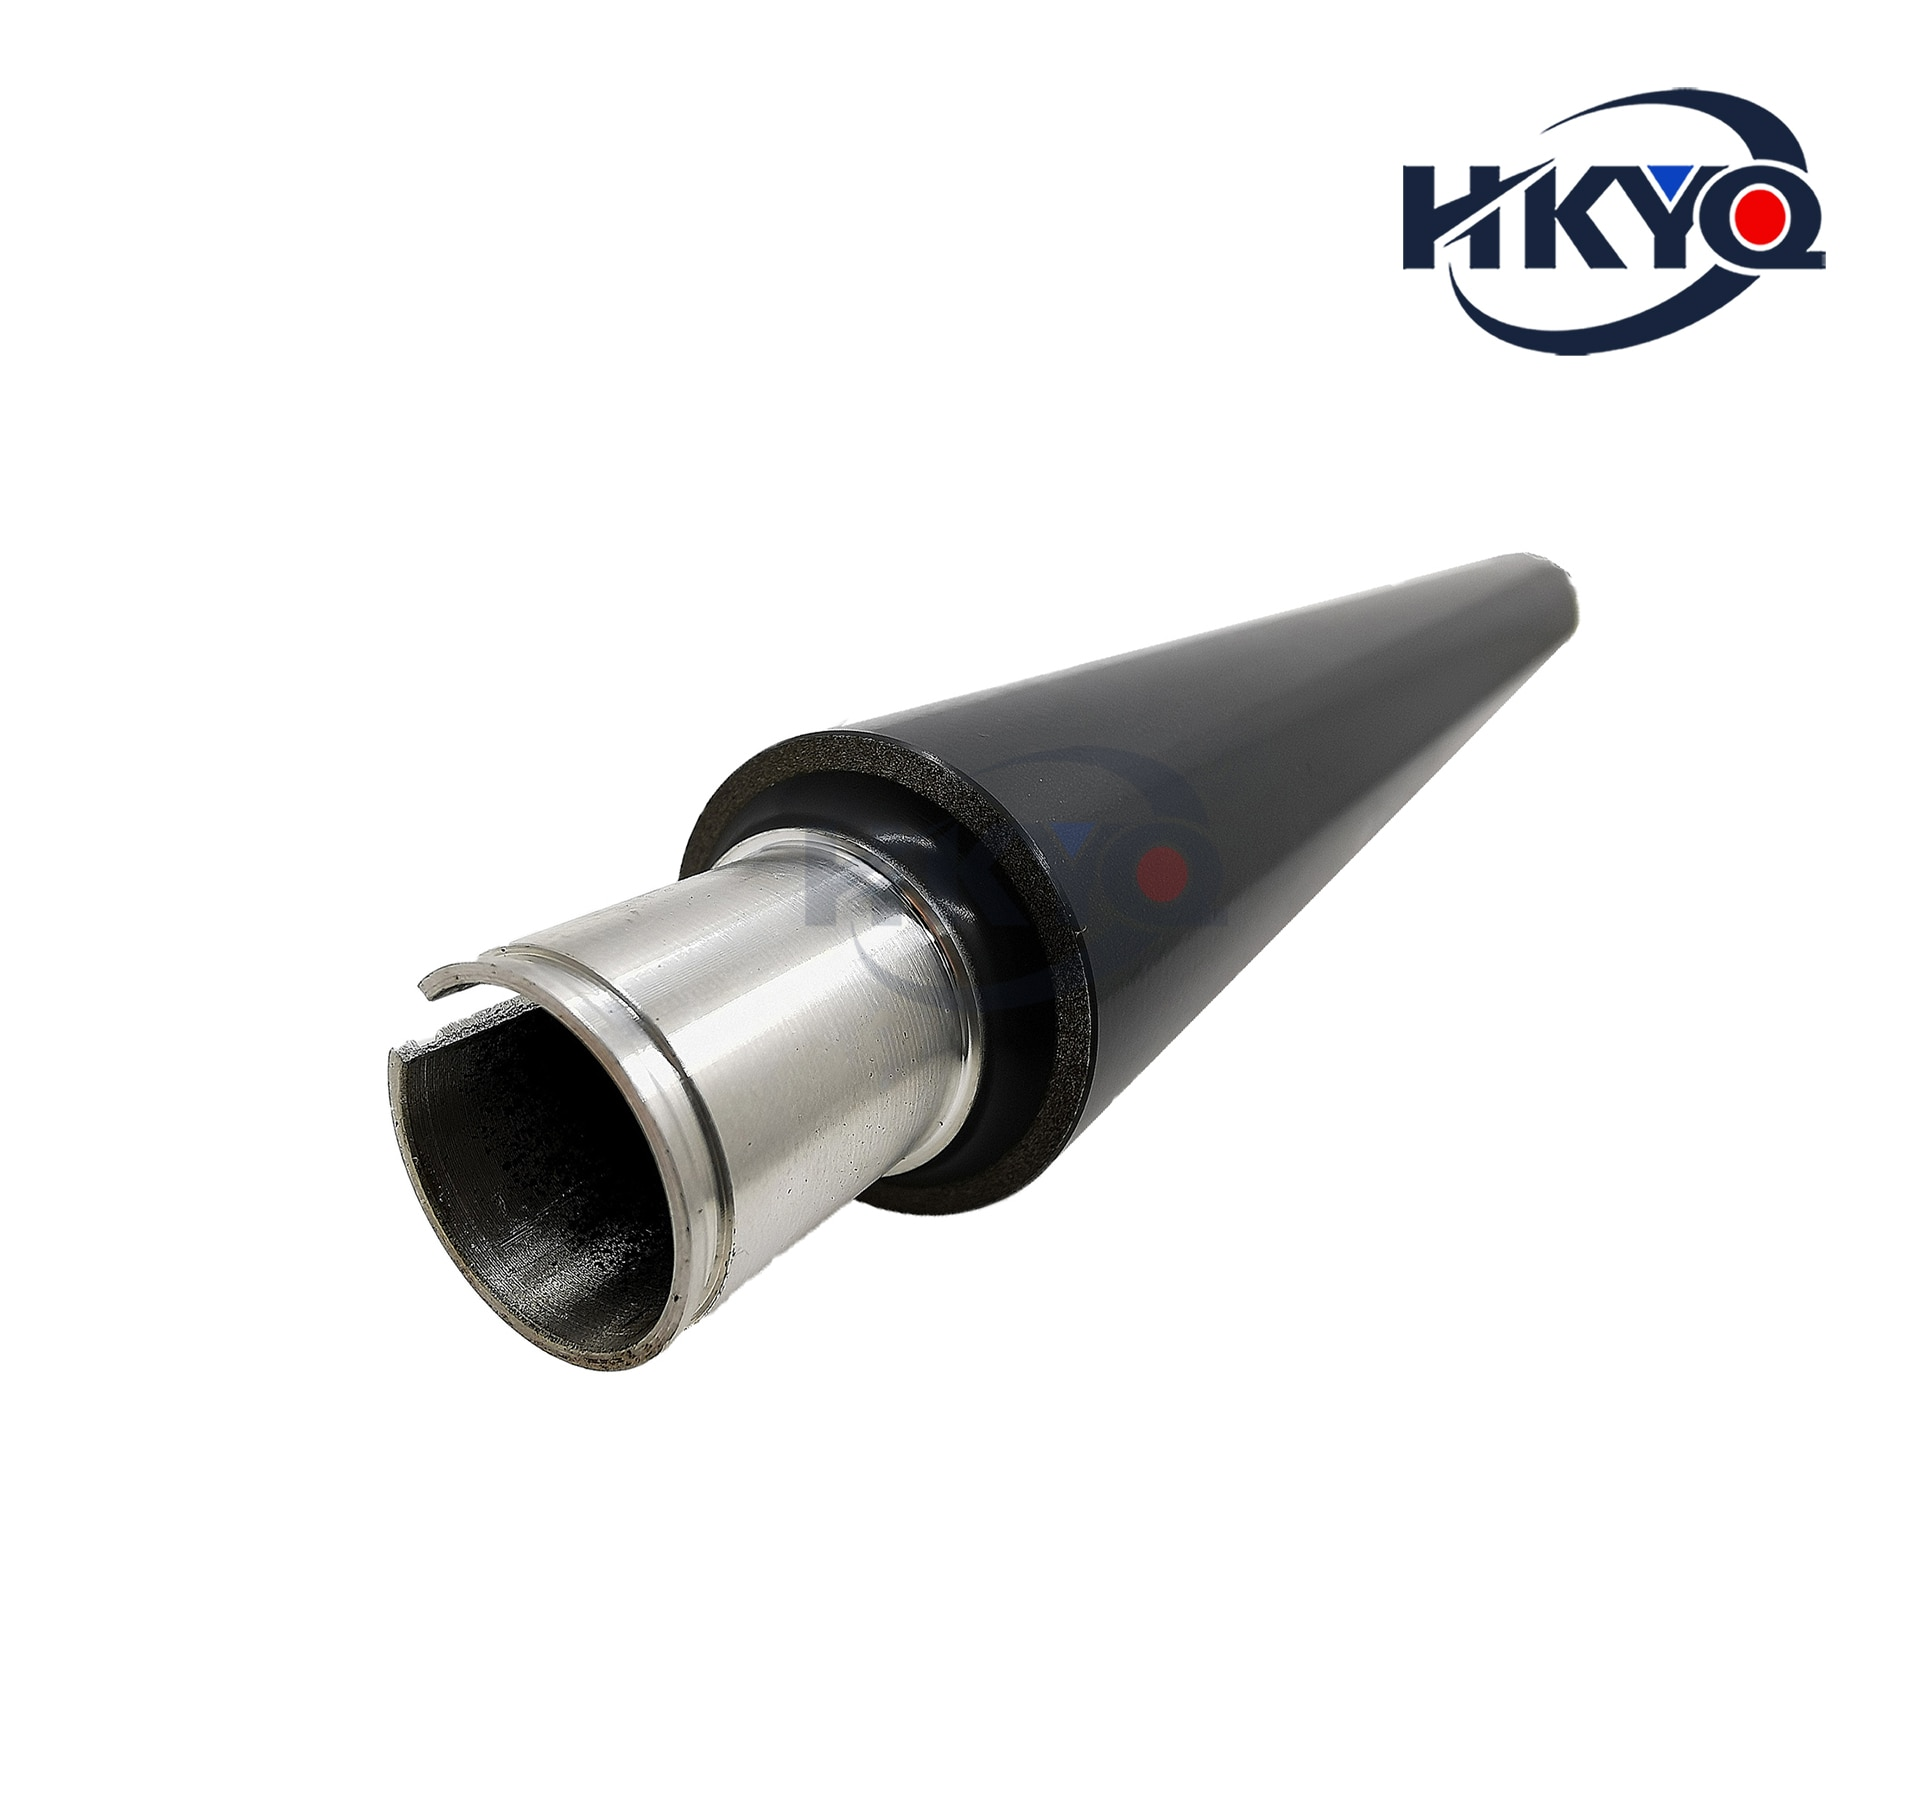 2X FS2100 M3040 M3540 FK-3100 fusor superior rodillo de calor para Kyocera FS 2100D 2100DN 2100 ECOSYS M3040dn M3040idn M3540dn M3540idn